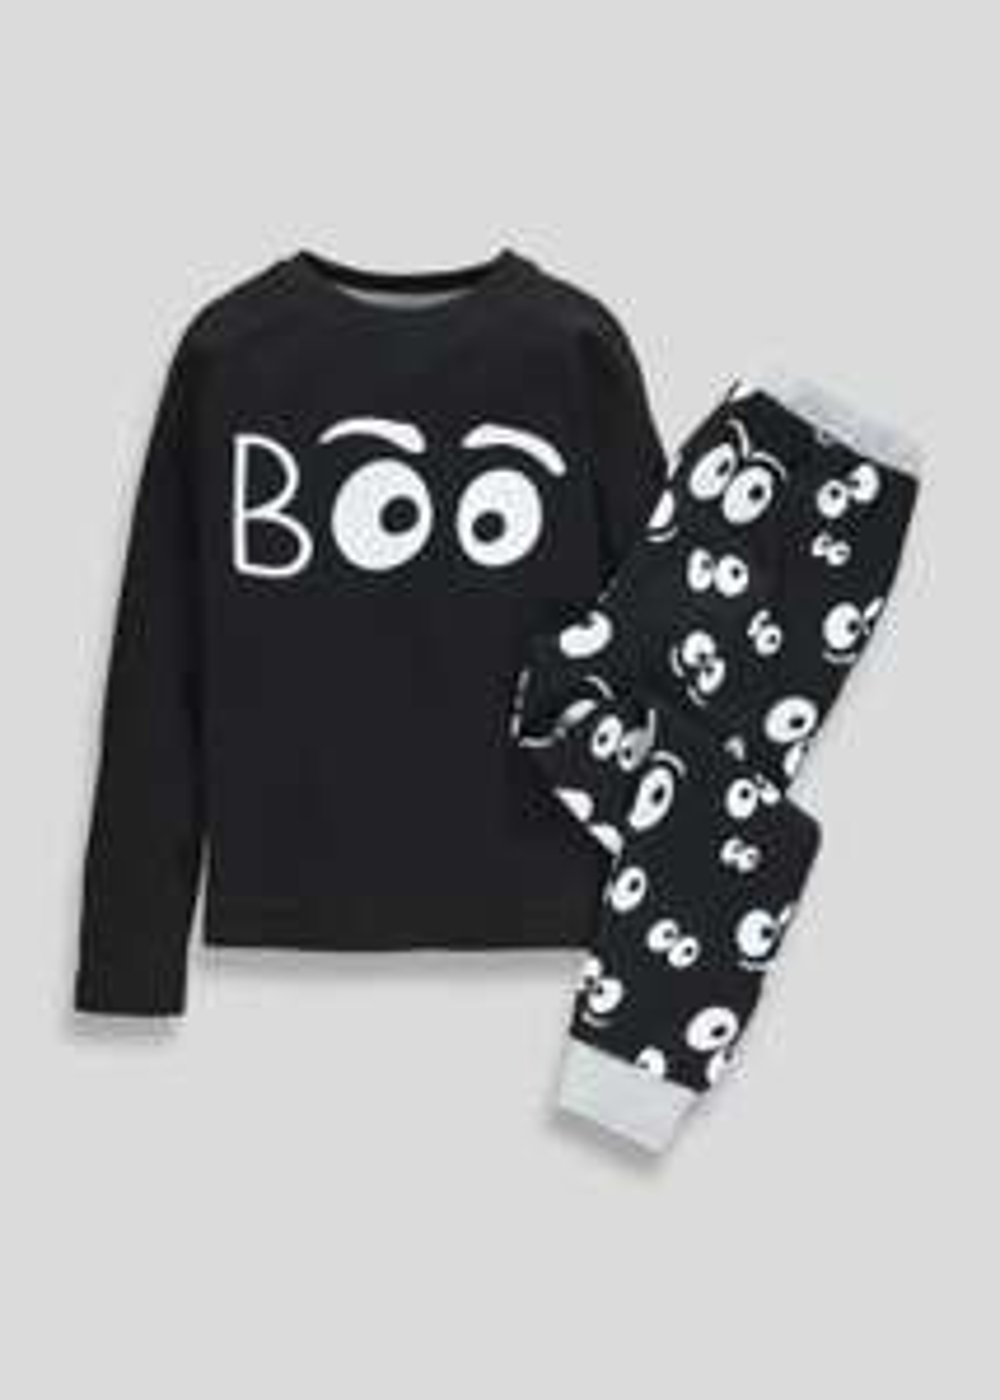 5158f9aa5 Boo Childrens Halloween pyjamas now £3.50 – £4 ( various sizes ) @ Matalan  C+C £3.50